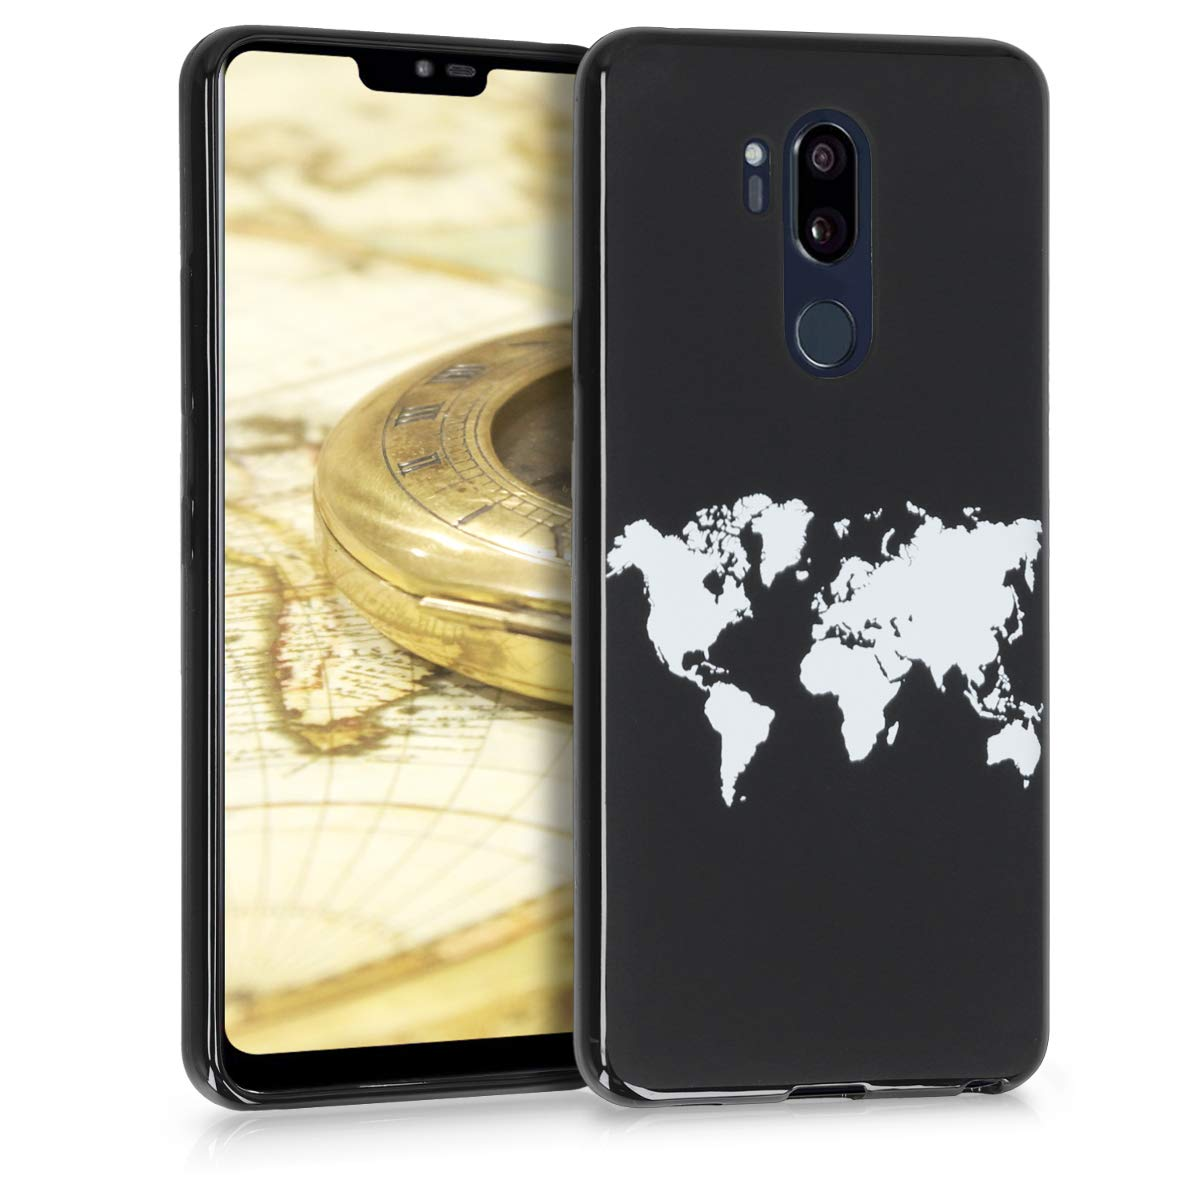 kwmobile Funda para LG G7 ThinQ/Fit/One: Amazon.es: Electrónica